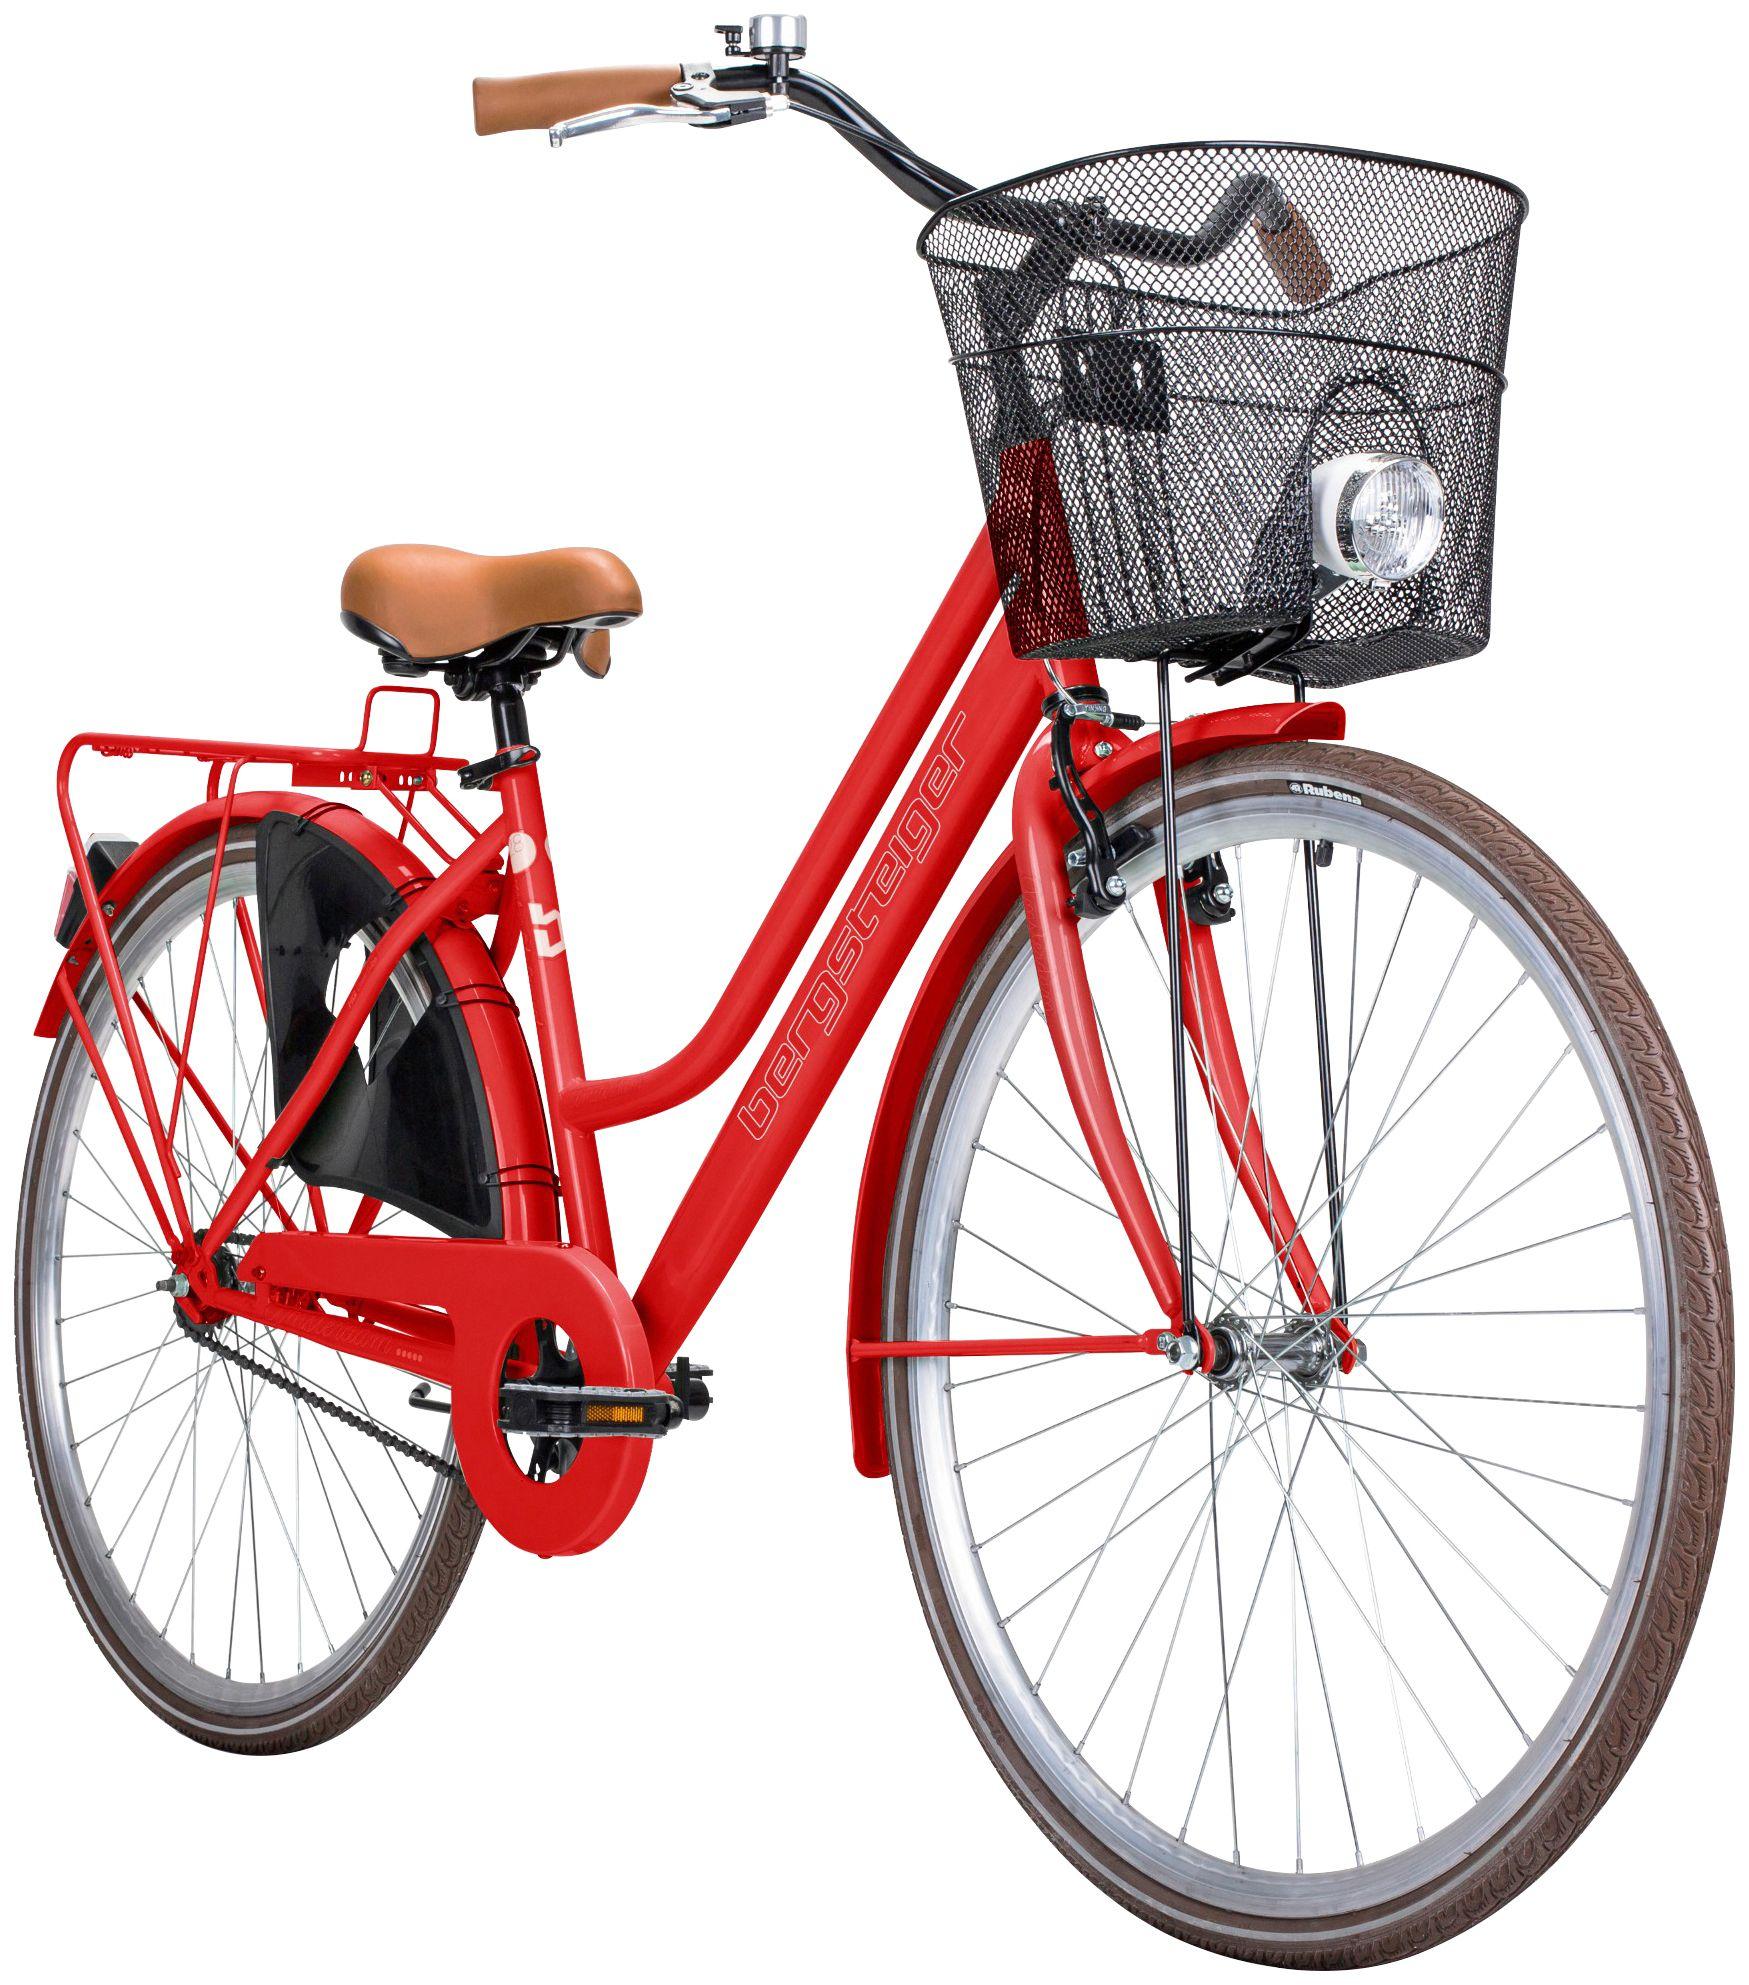 BERGSTEIGER Bergsteiger Citybike Damen »Amsterdam«, 28 Zoll, 1 Gang, V-Bremsen